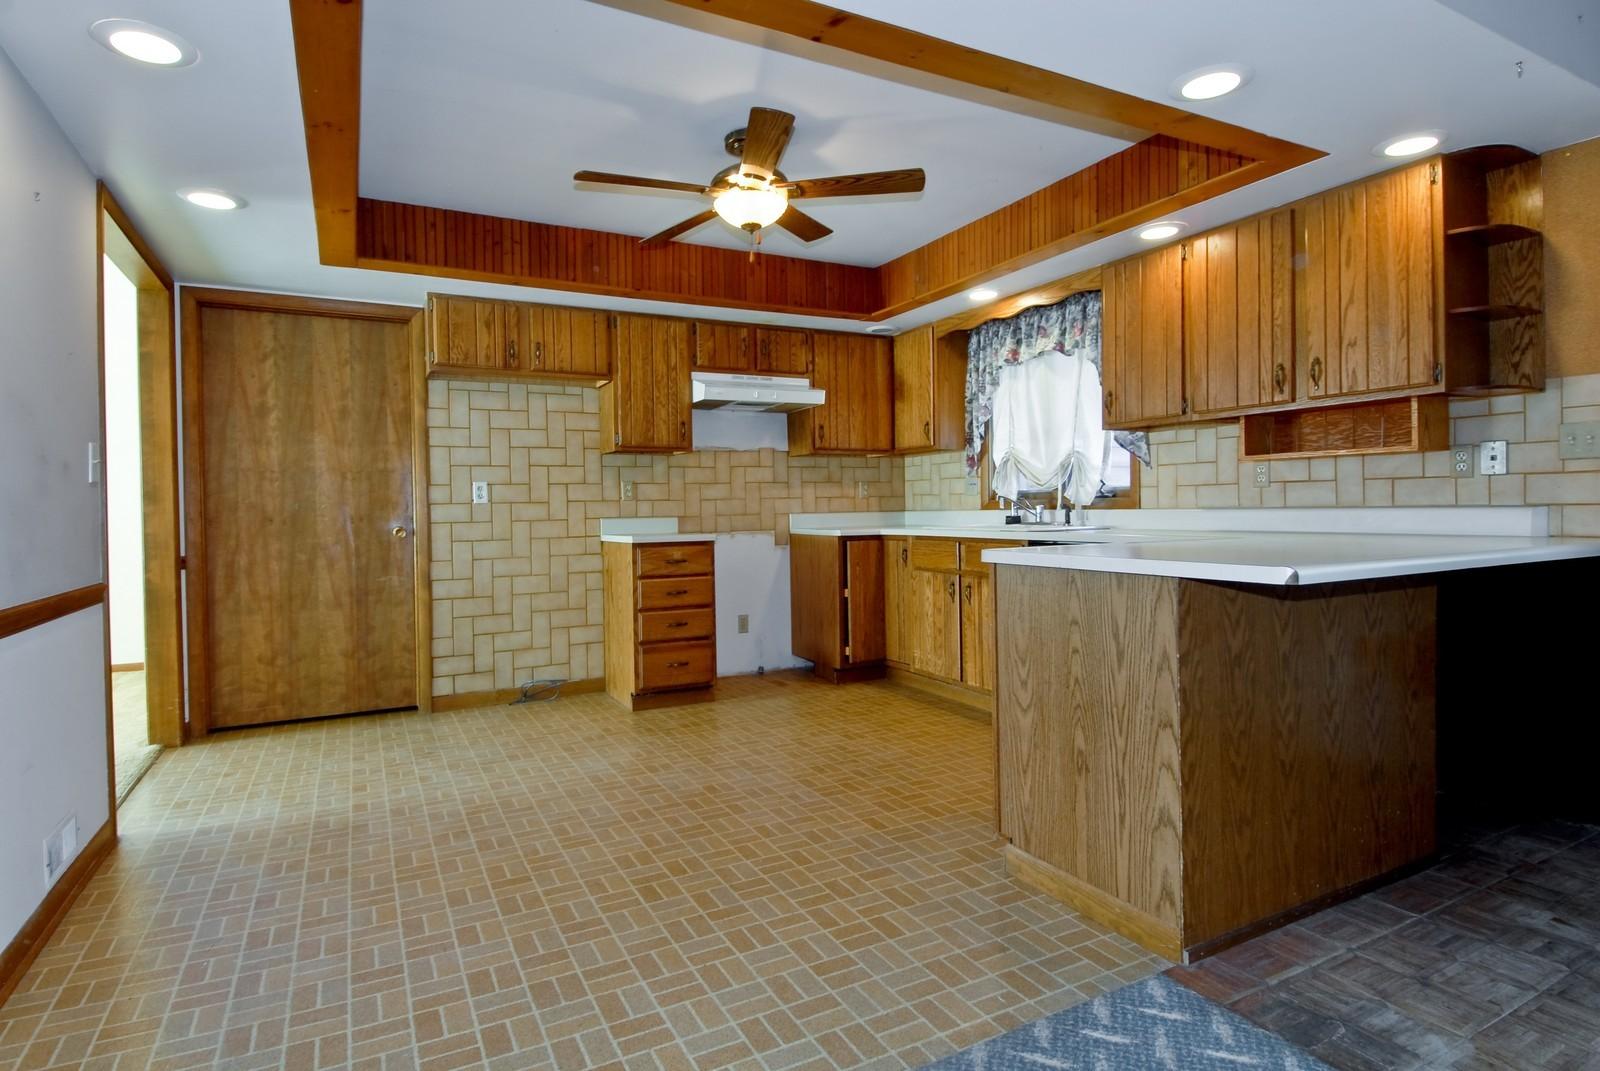 Real Estate Photography - 625 Konen Ave, Aurora, IL, 60505 - Kitchen